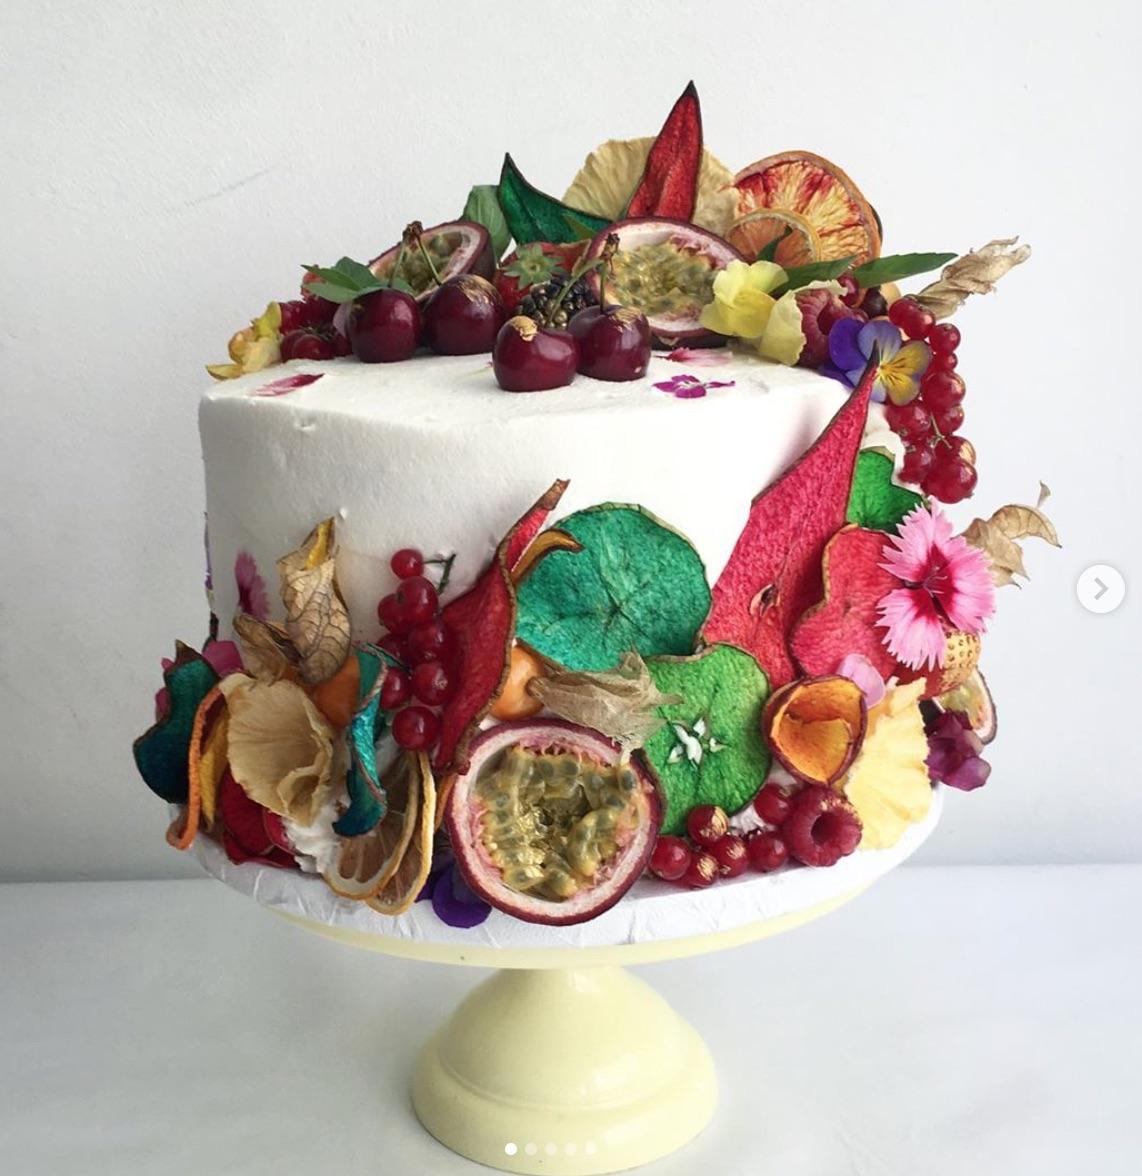 abielle bakery brighton cakes